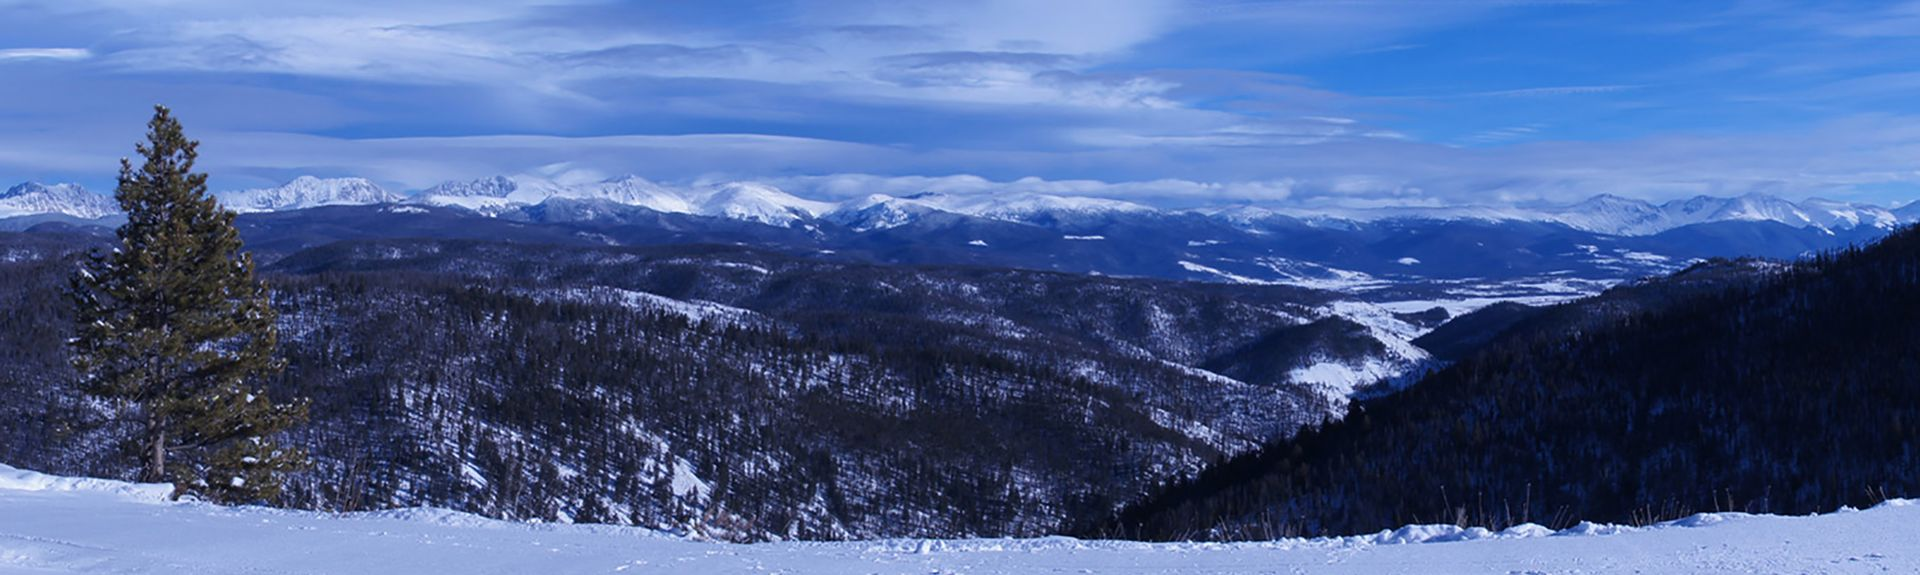 The Mountainside, Granby, CO, USA